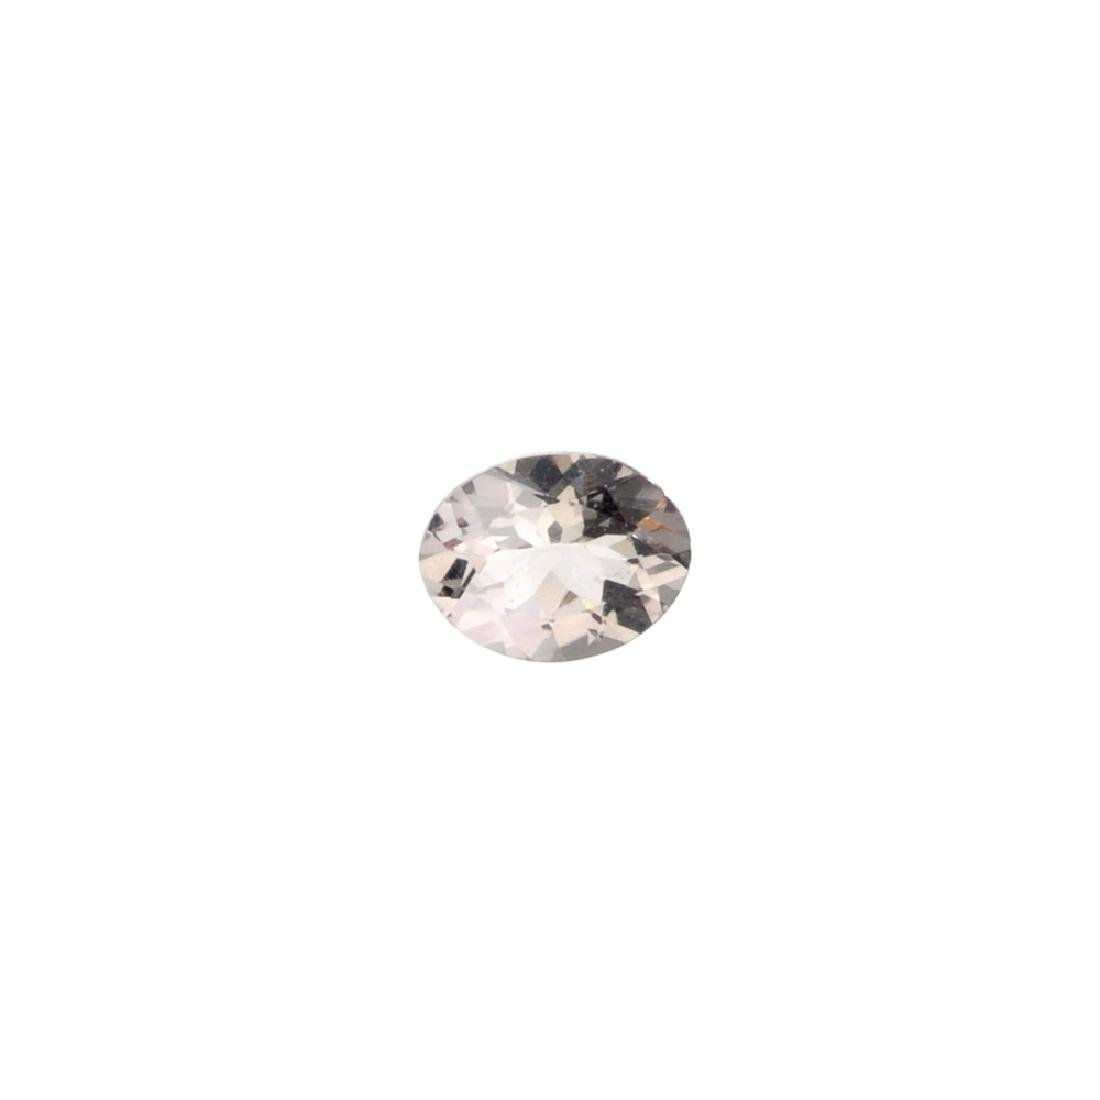 APP: 1.2k 1.66CT Oval Cut Morganite Gemstone